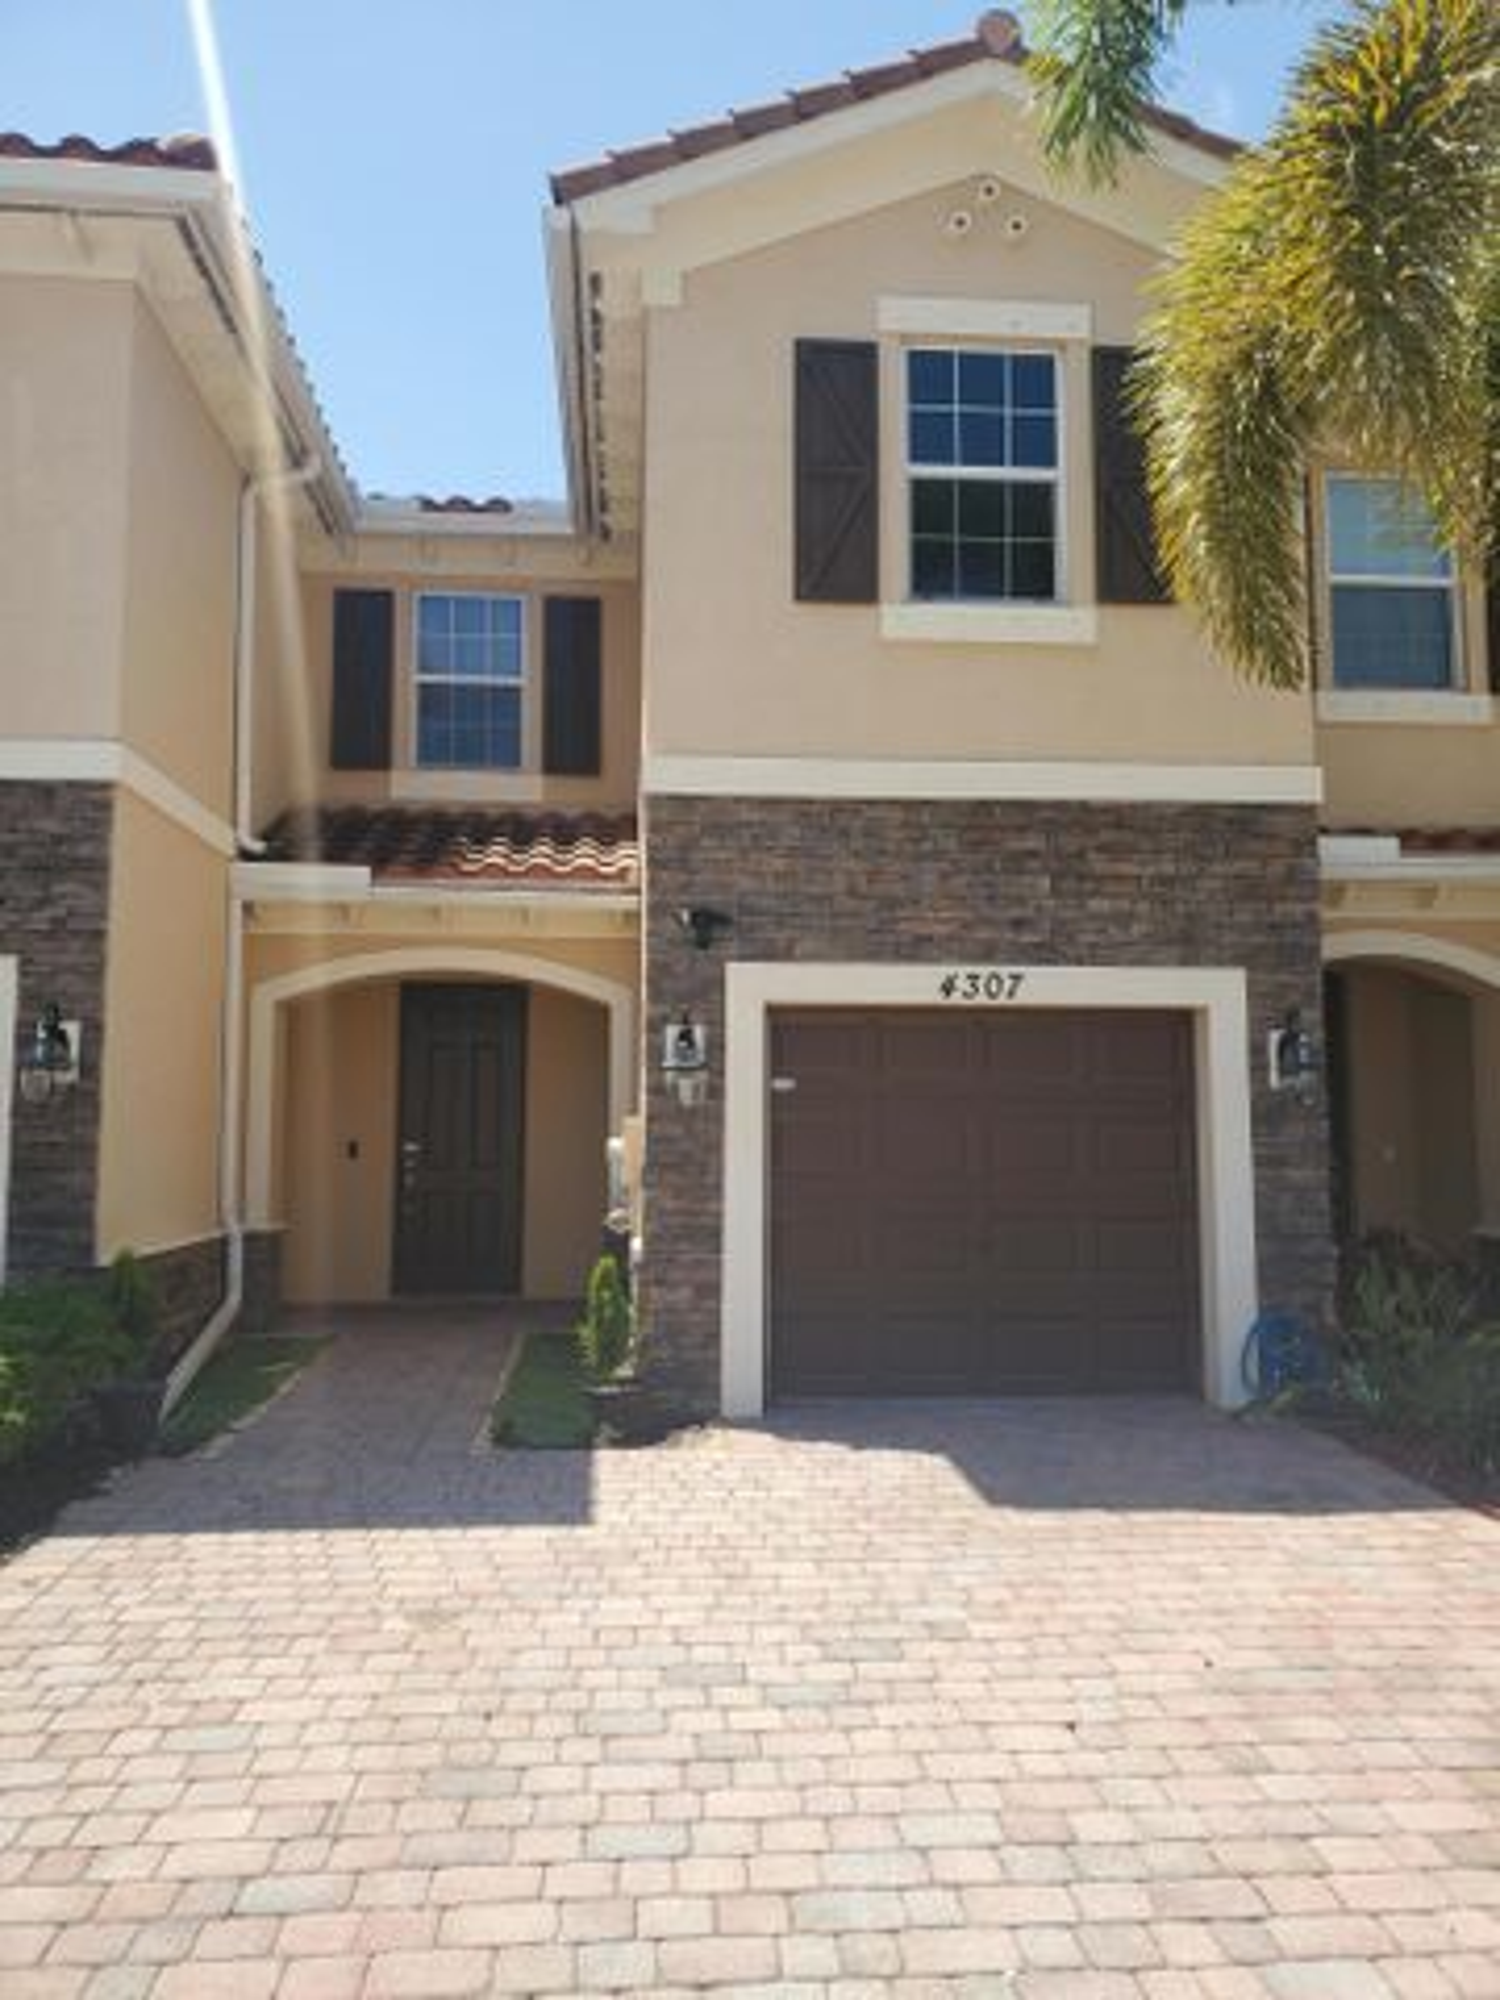 4307 Chalmers Lane, West Palm Beach, FL 33417